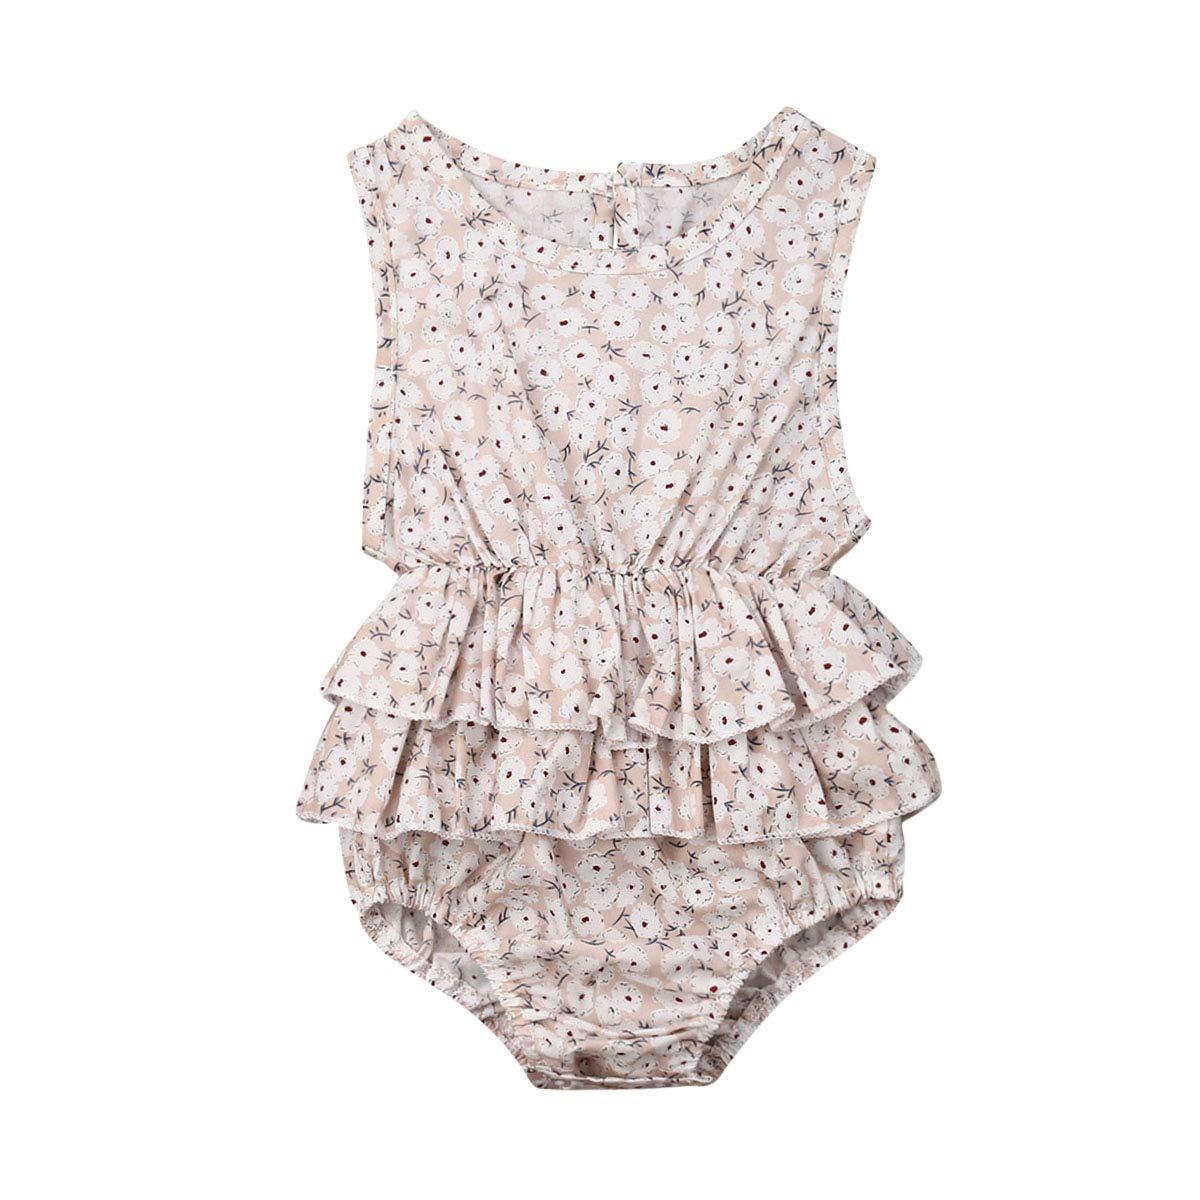 Newborn Baby Girl Romper Floral Print Vintage Jumpsuit Outfit Playsuit Clothes (0-6M, Ruffles/Apricot)